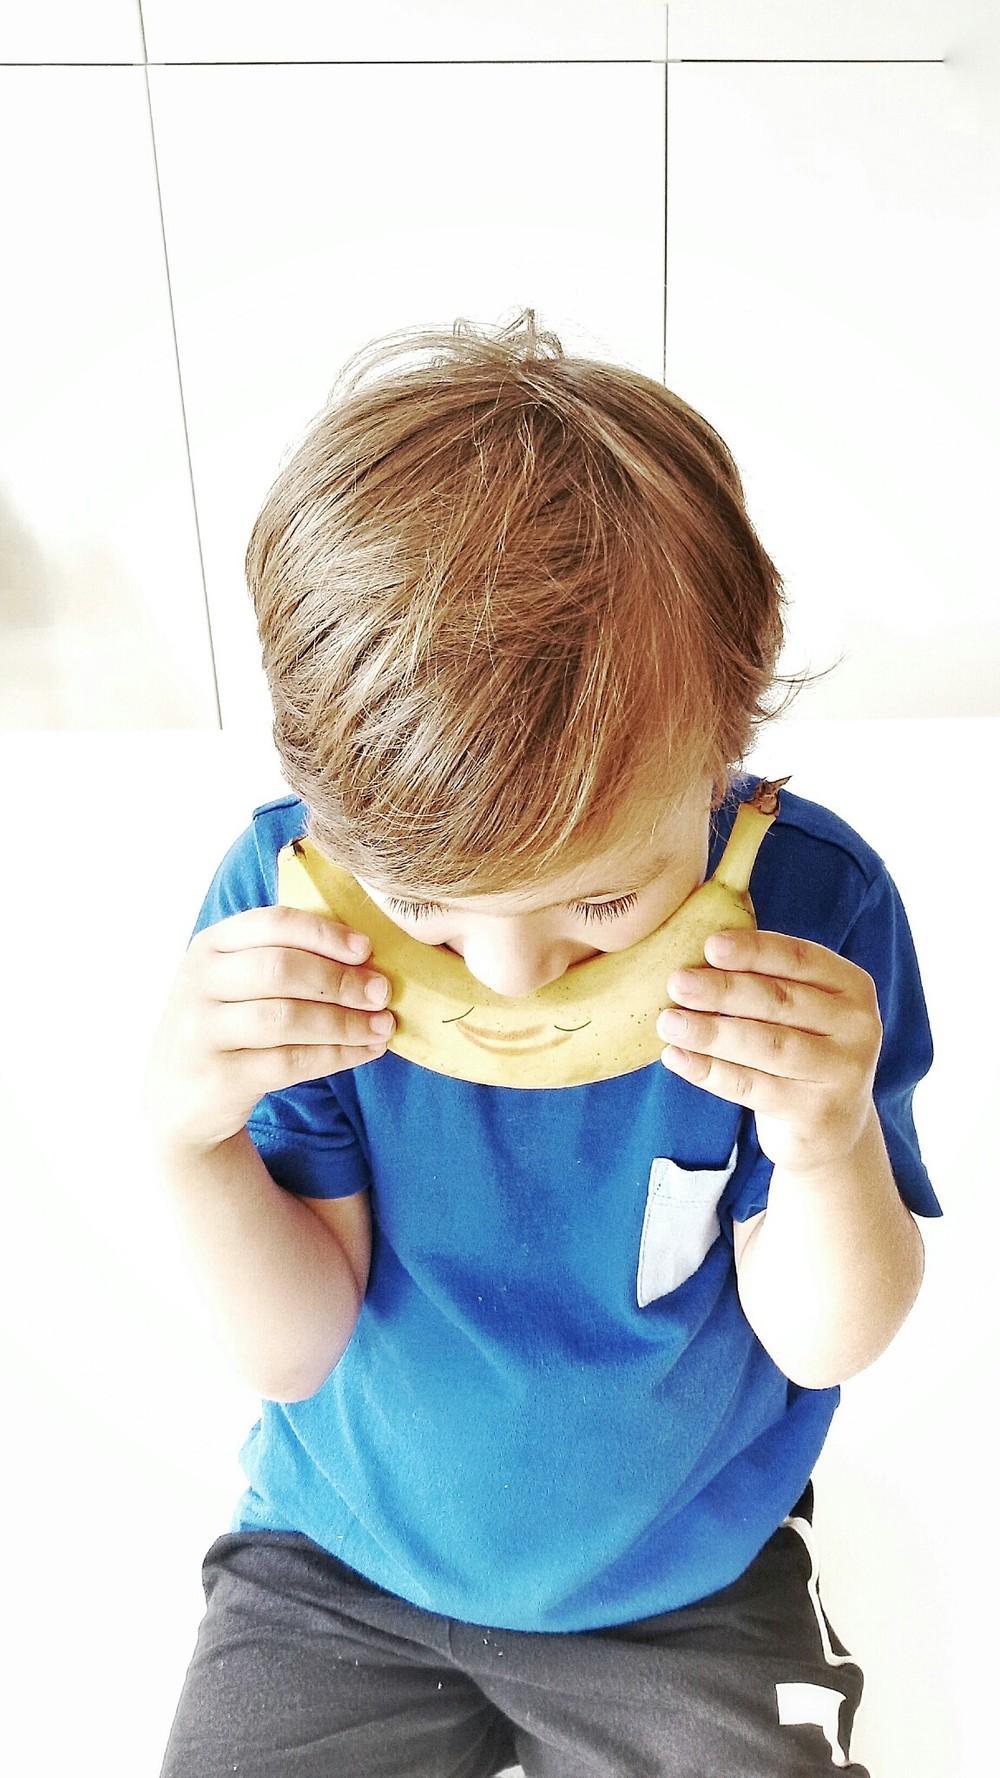 helden-des-alltags-banane